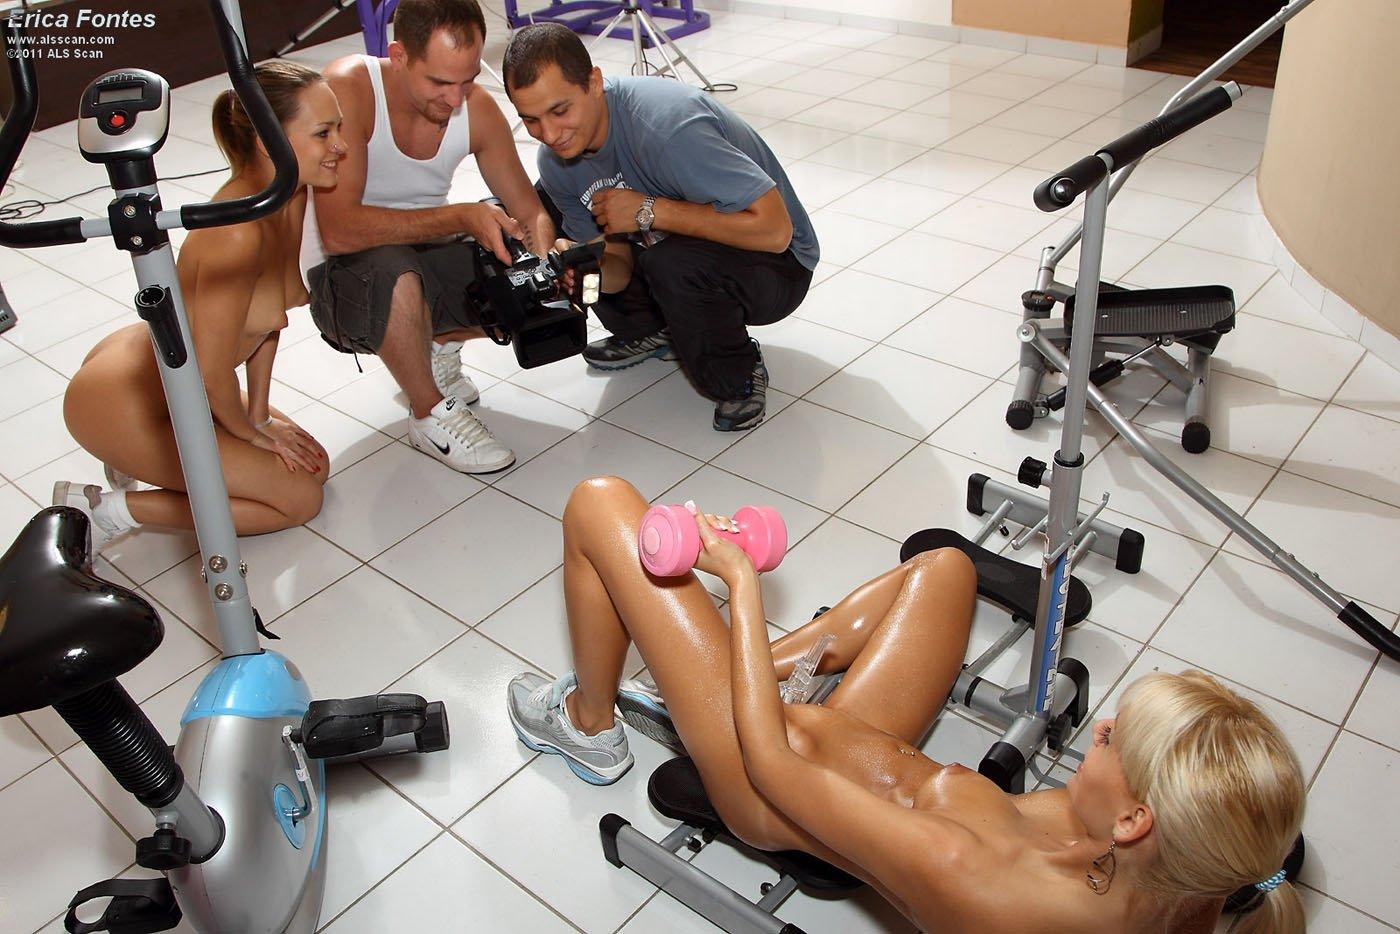 В спортзале - Фото галерея 798847